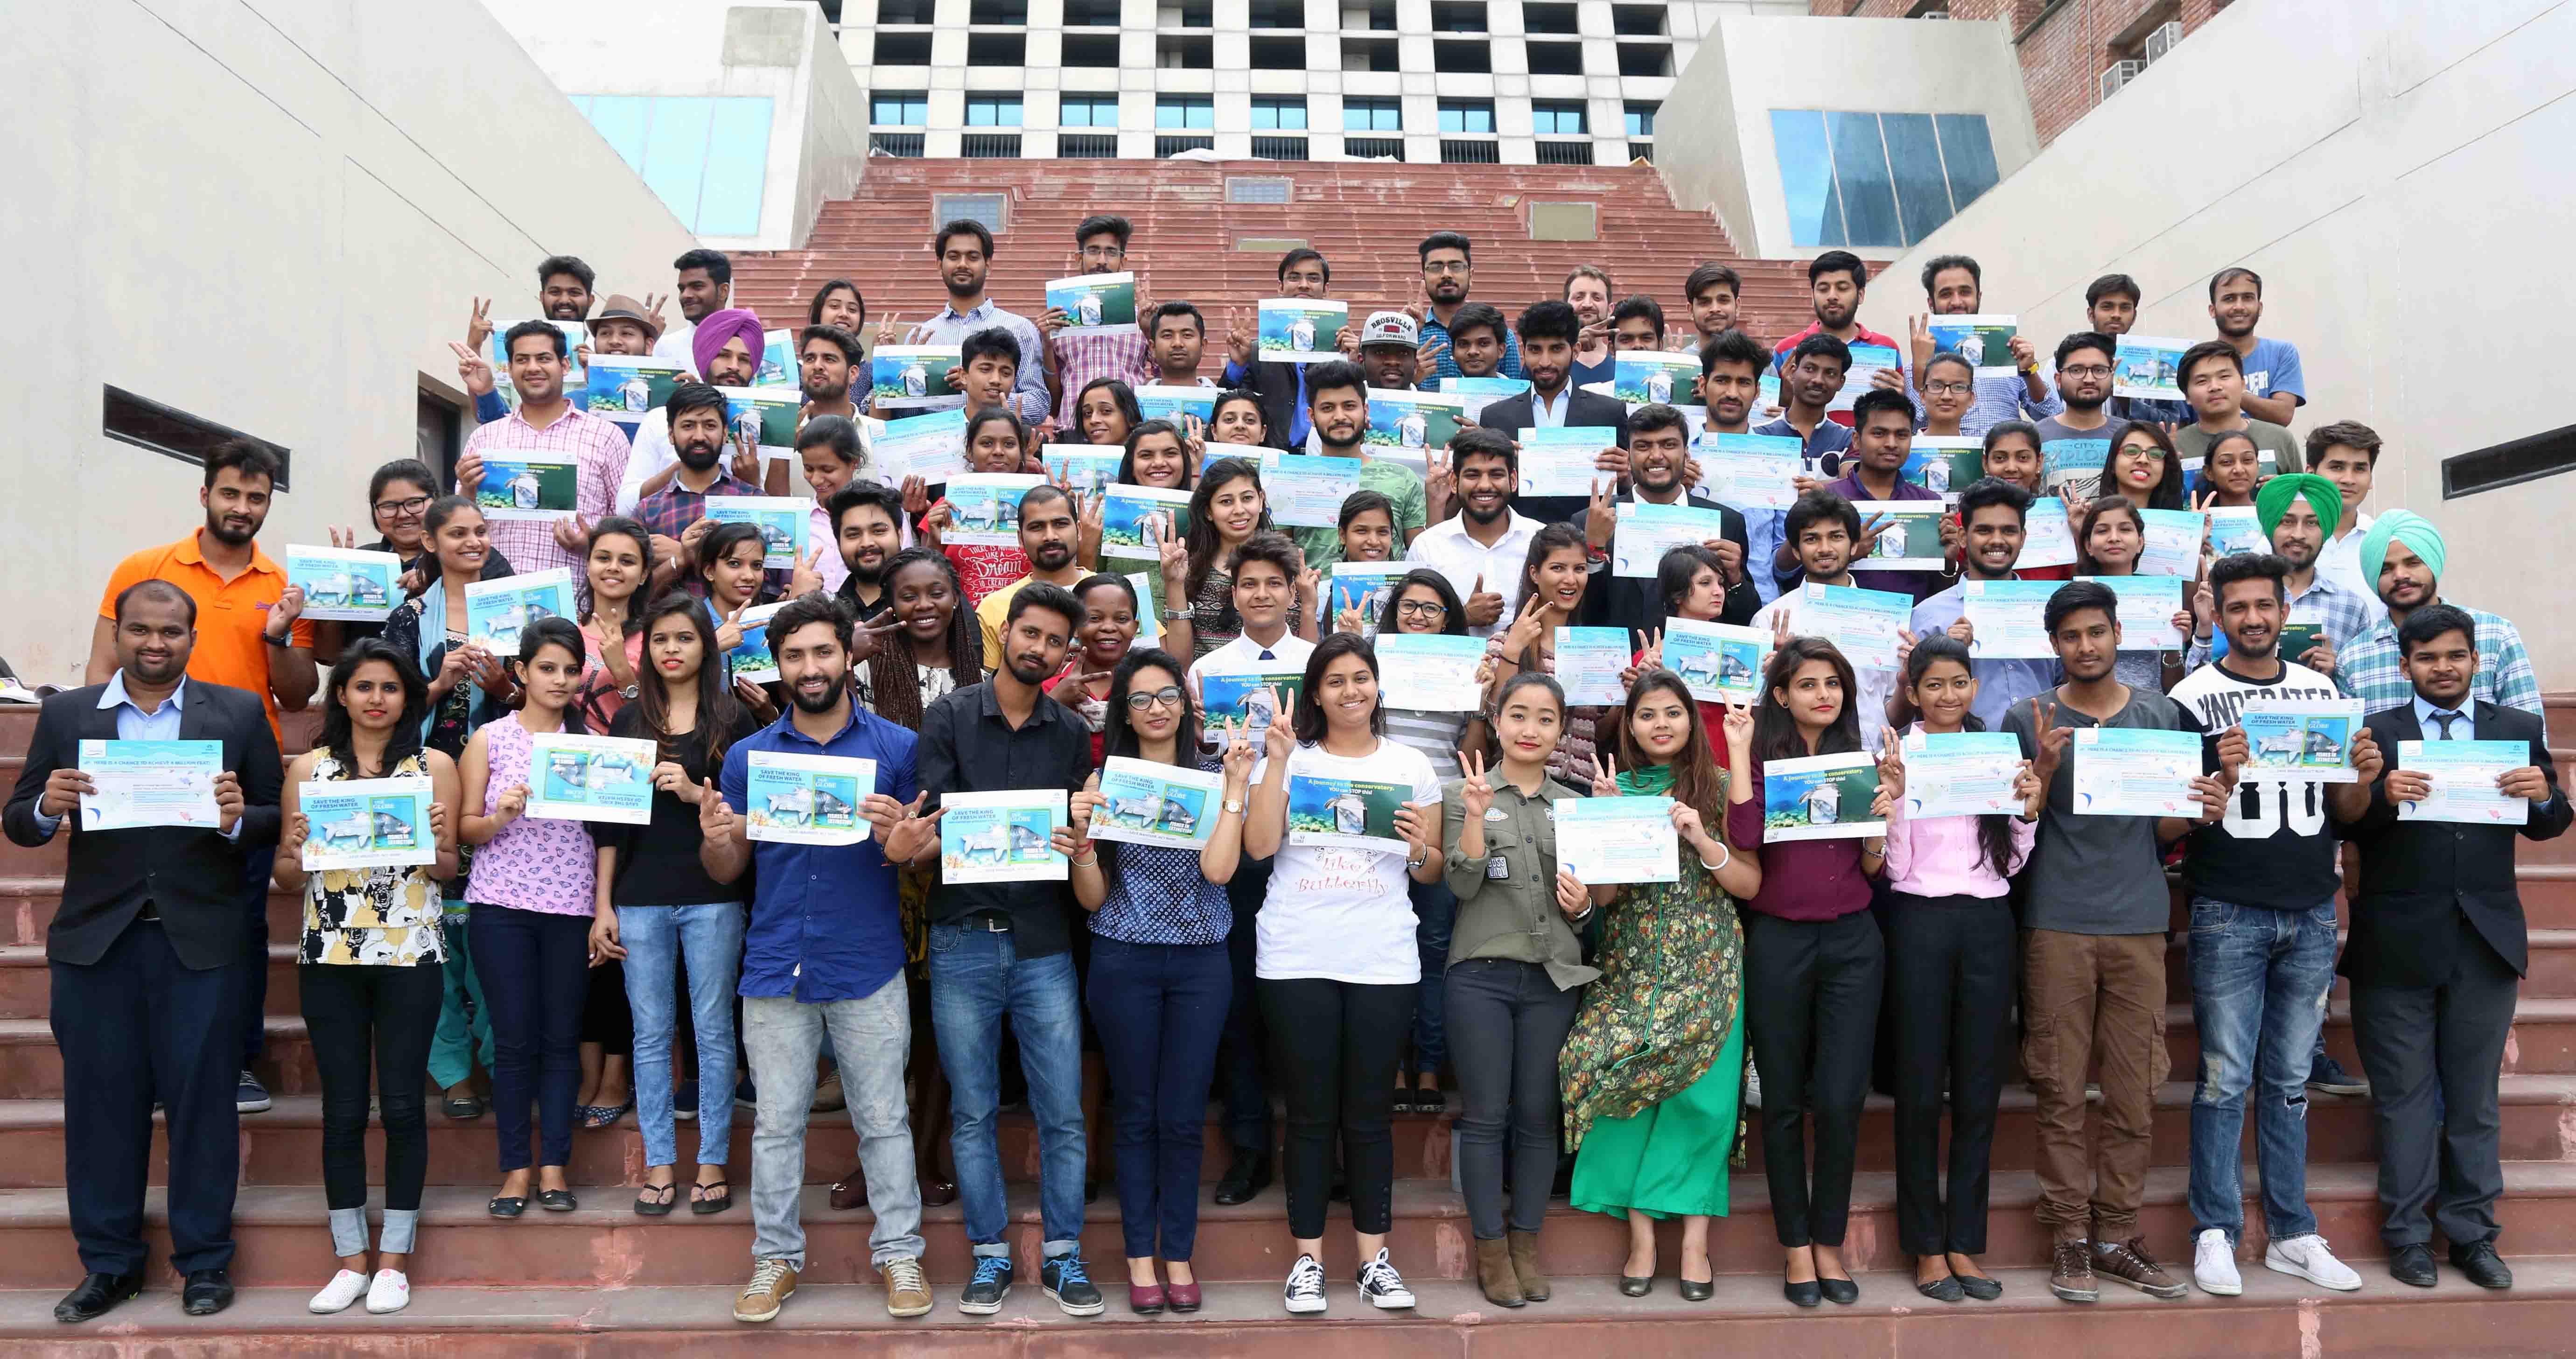 Tata Group Company & LPU associated for Corporate Social Responsibility